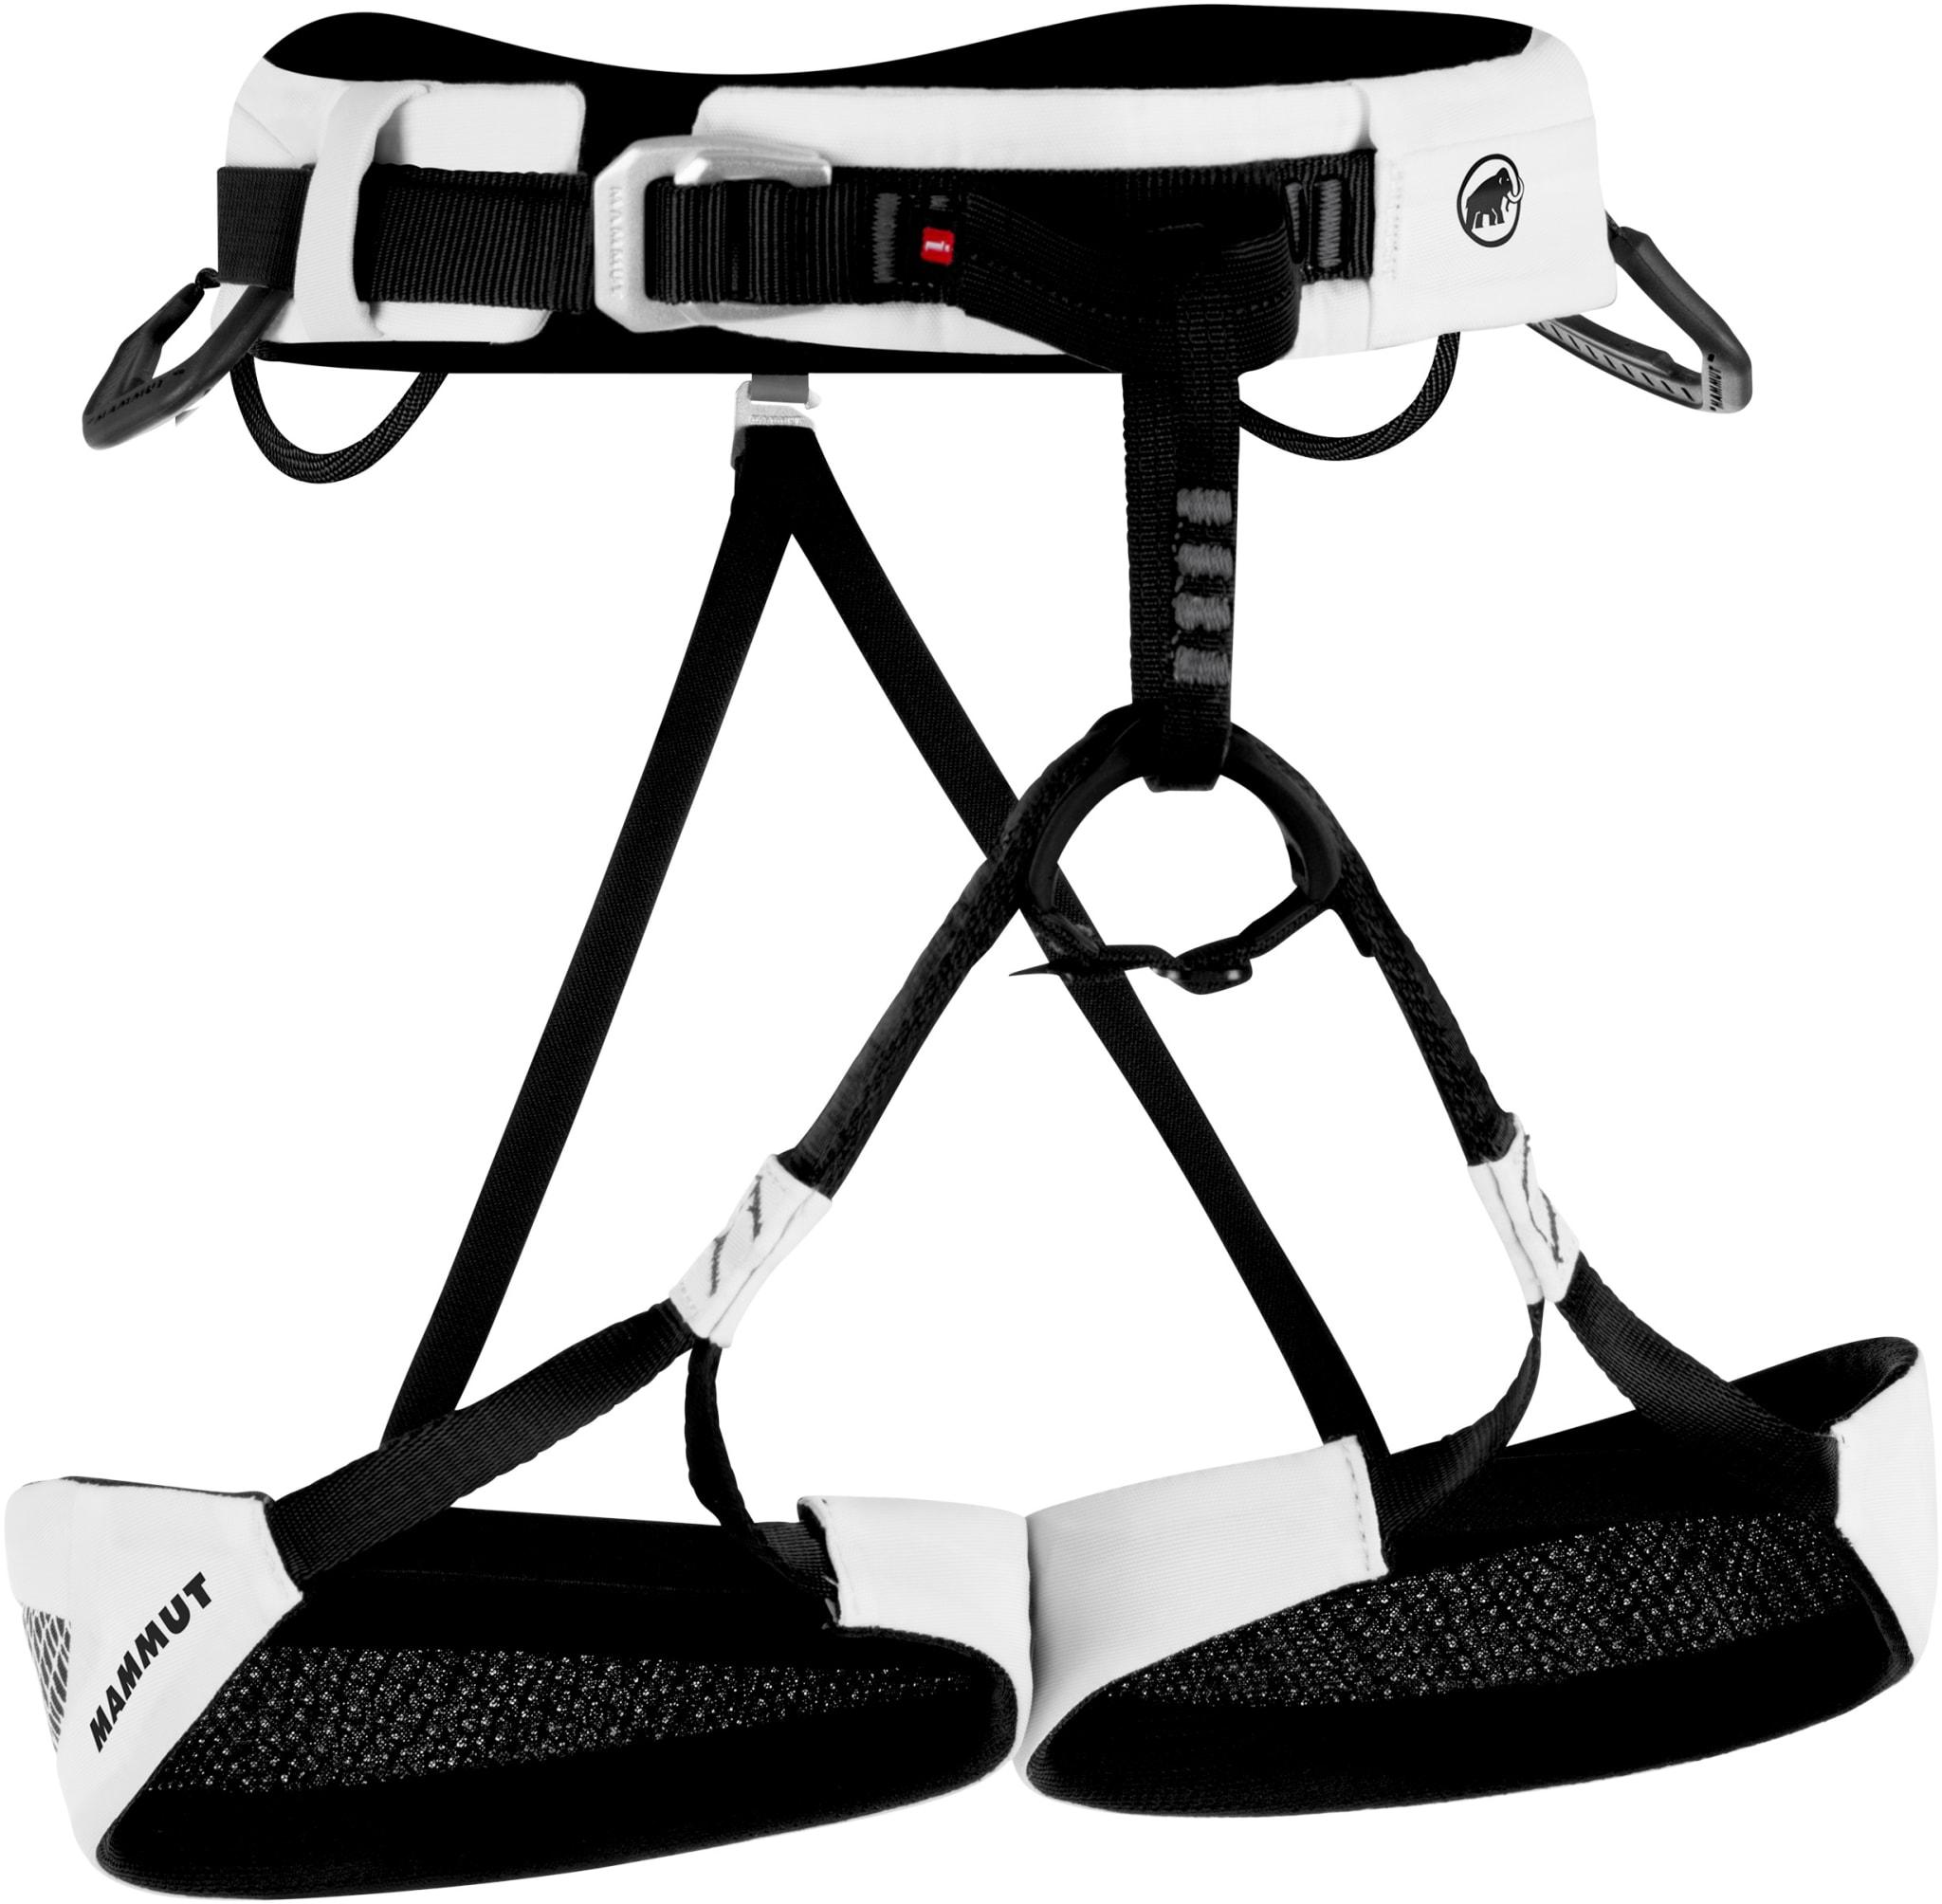 Ultralett klatresele for sportsklatring